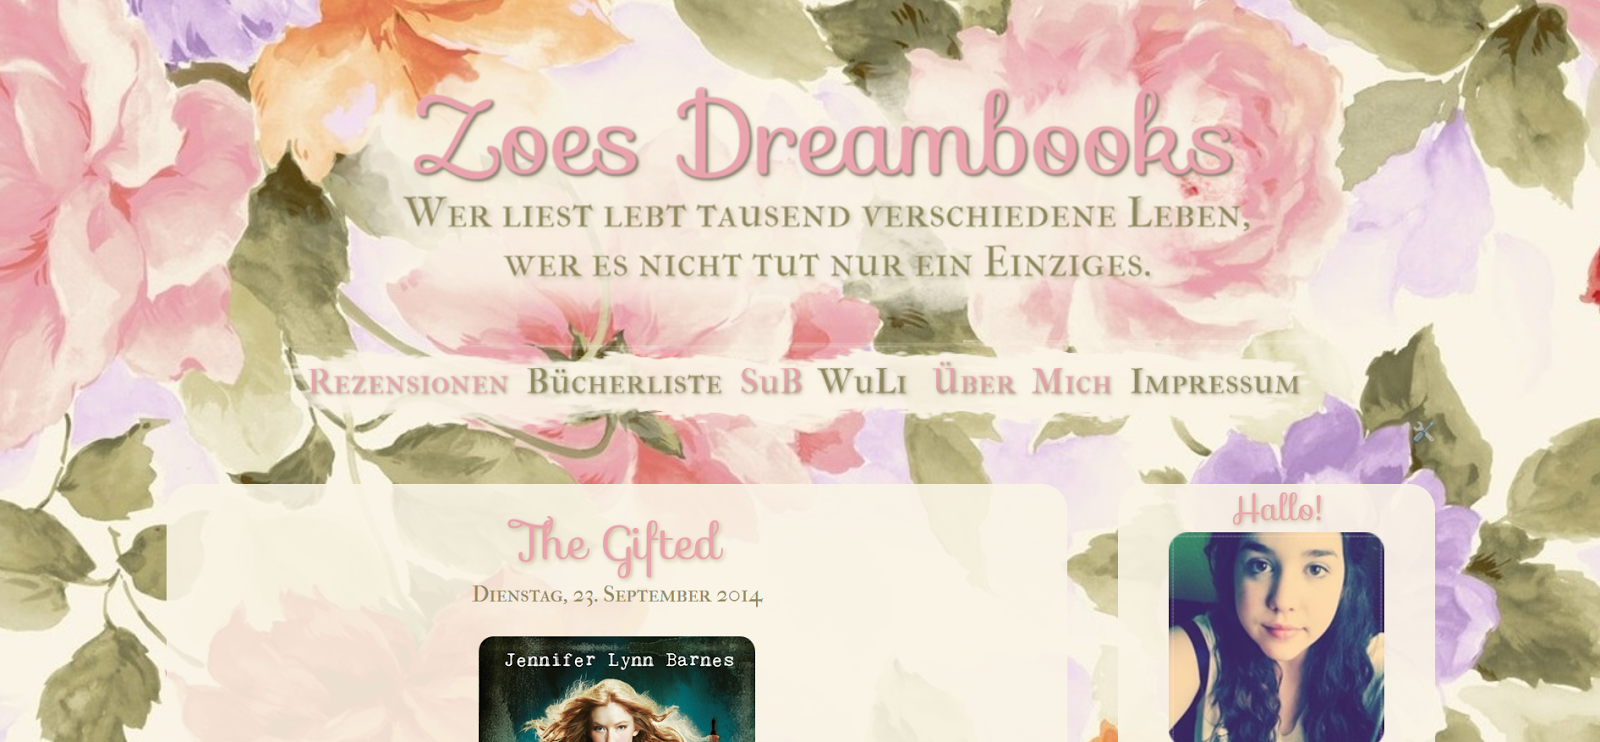 http://zoesdreambooks.blogspot.de/